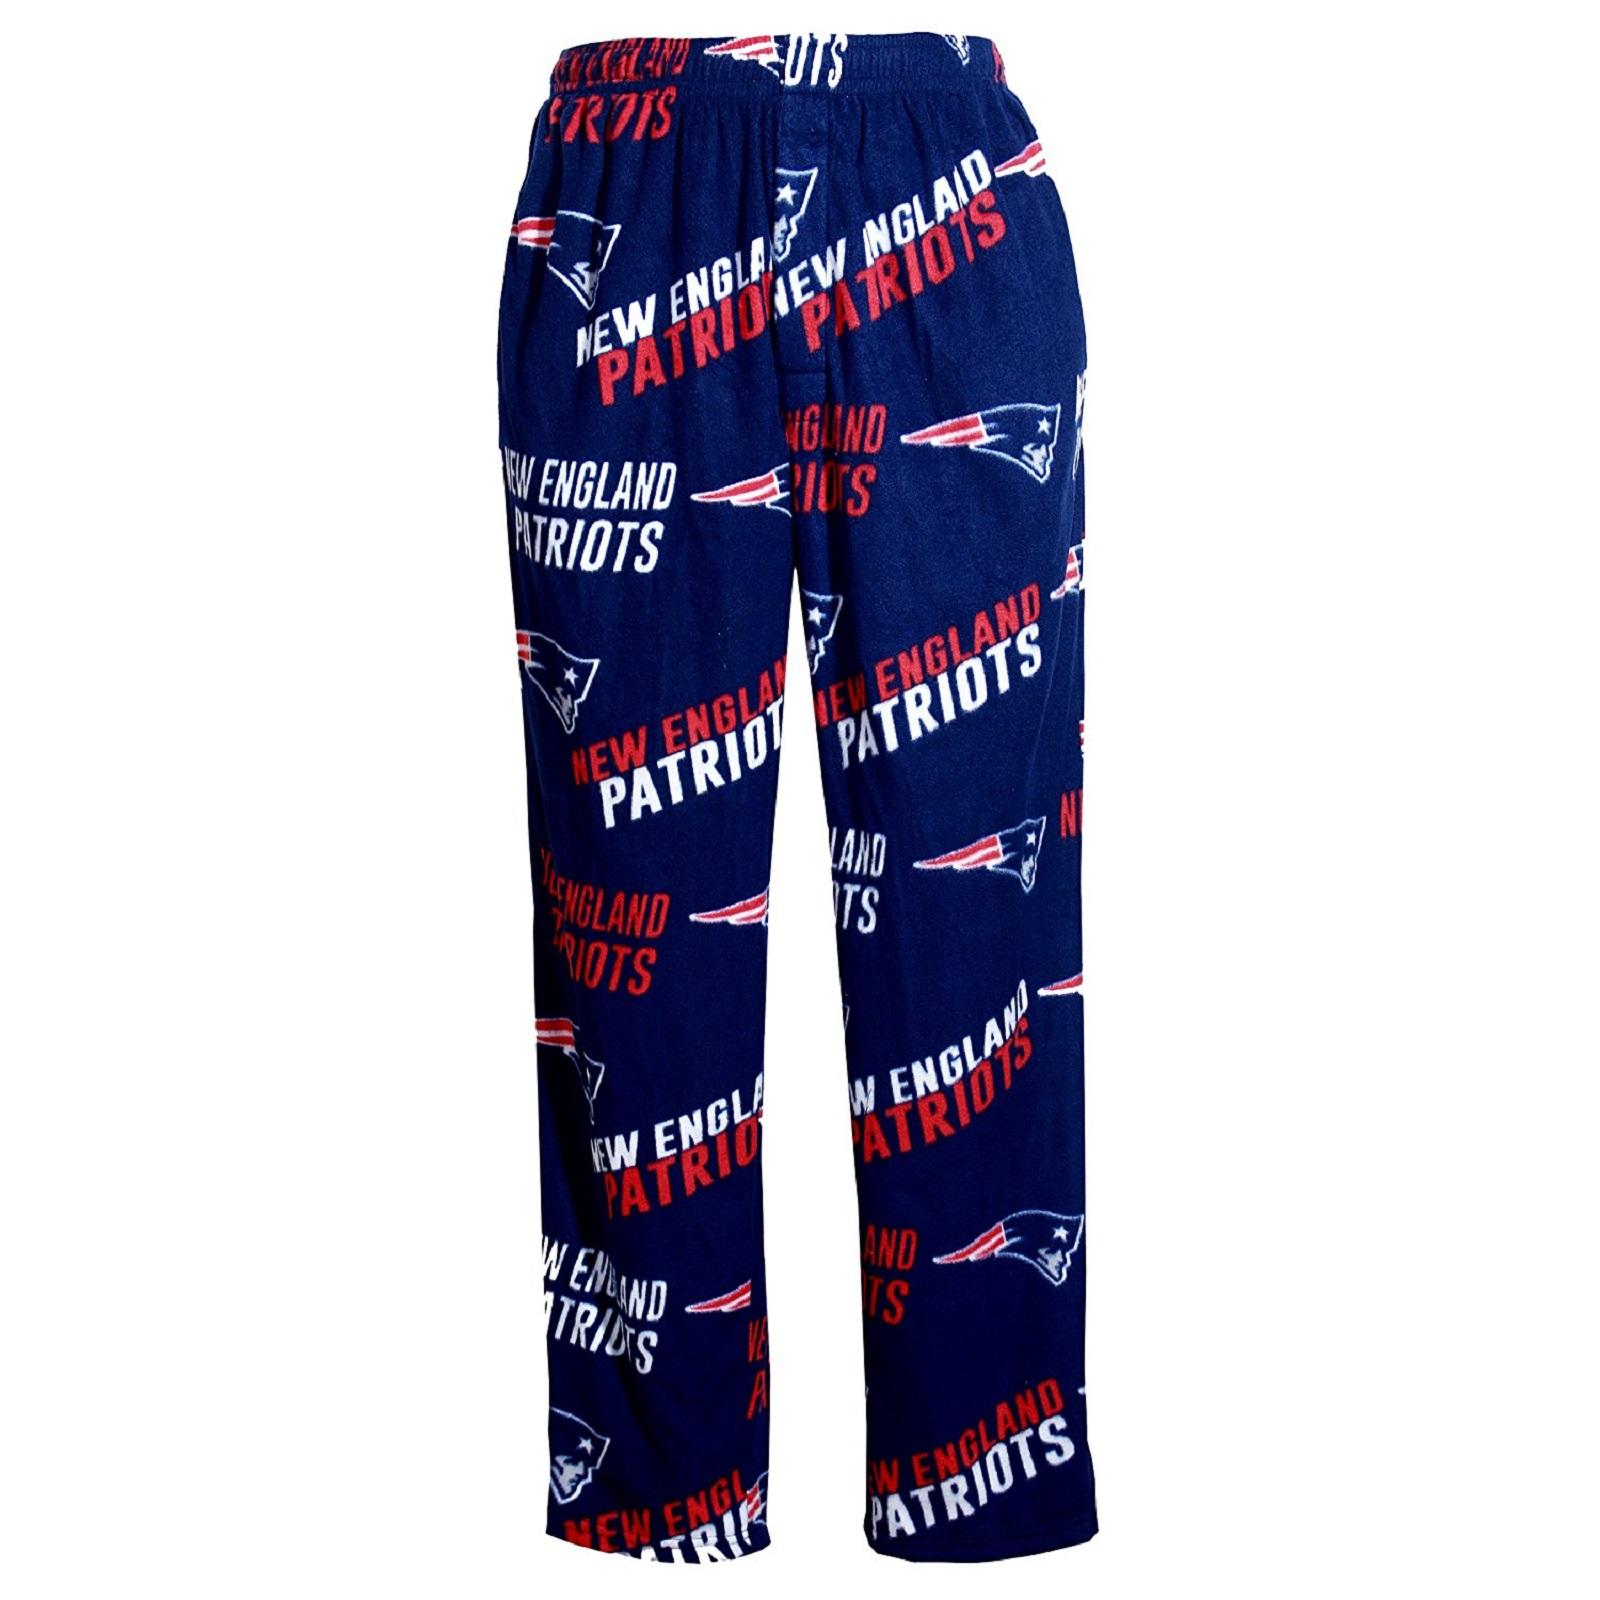 NFL Concepts Sports Wildcard Men's Pajama Pants-16 TEAMS ...